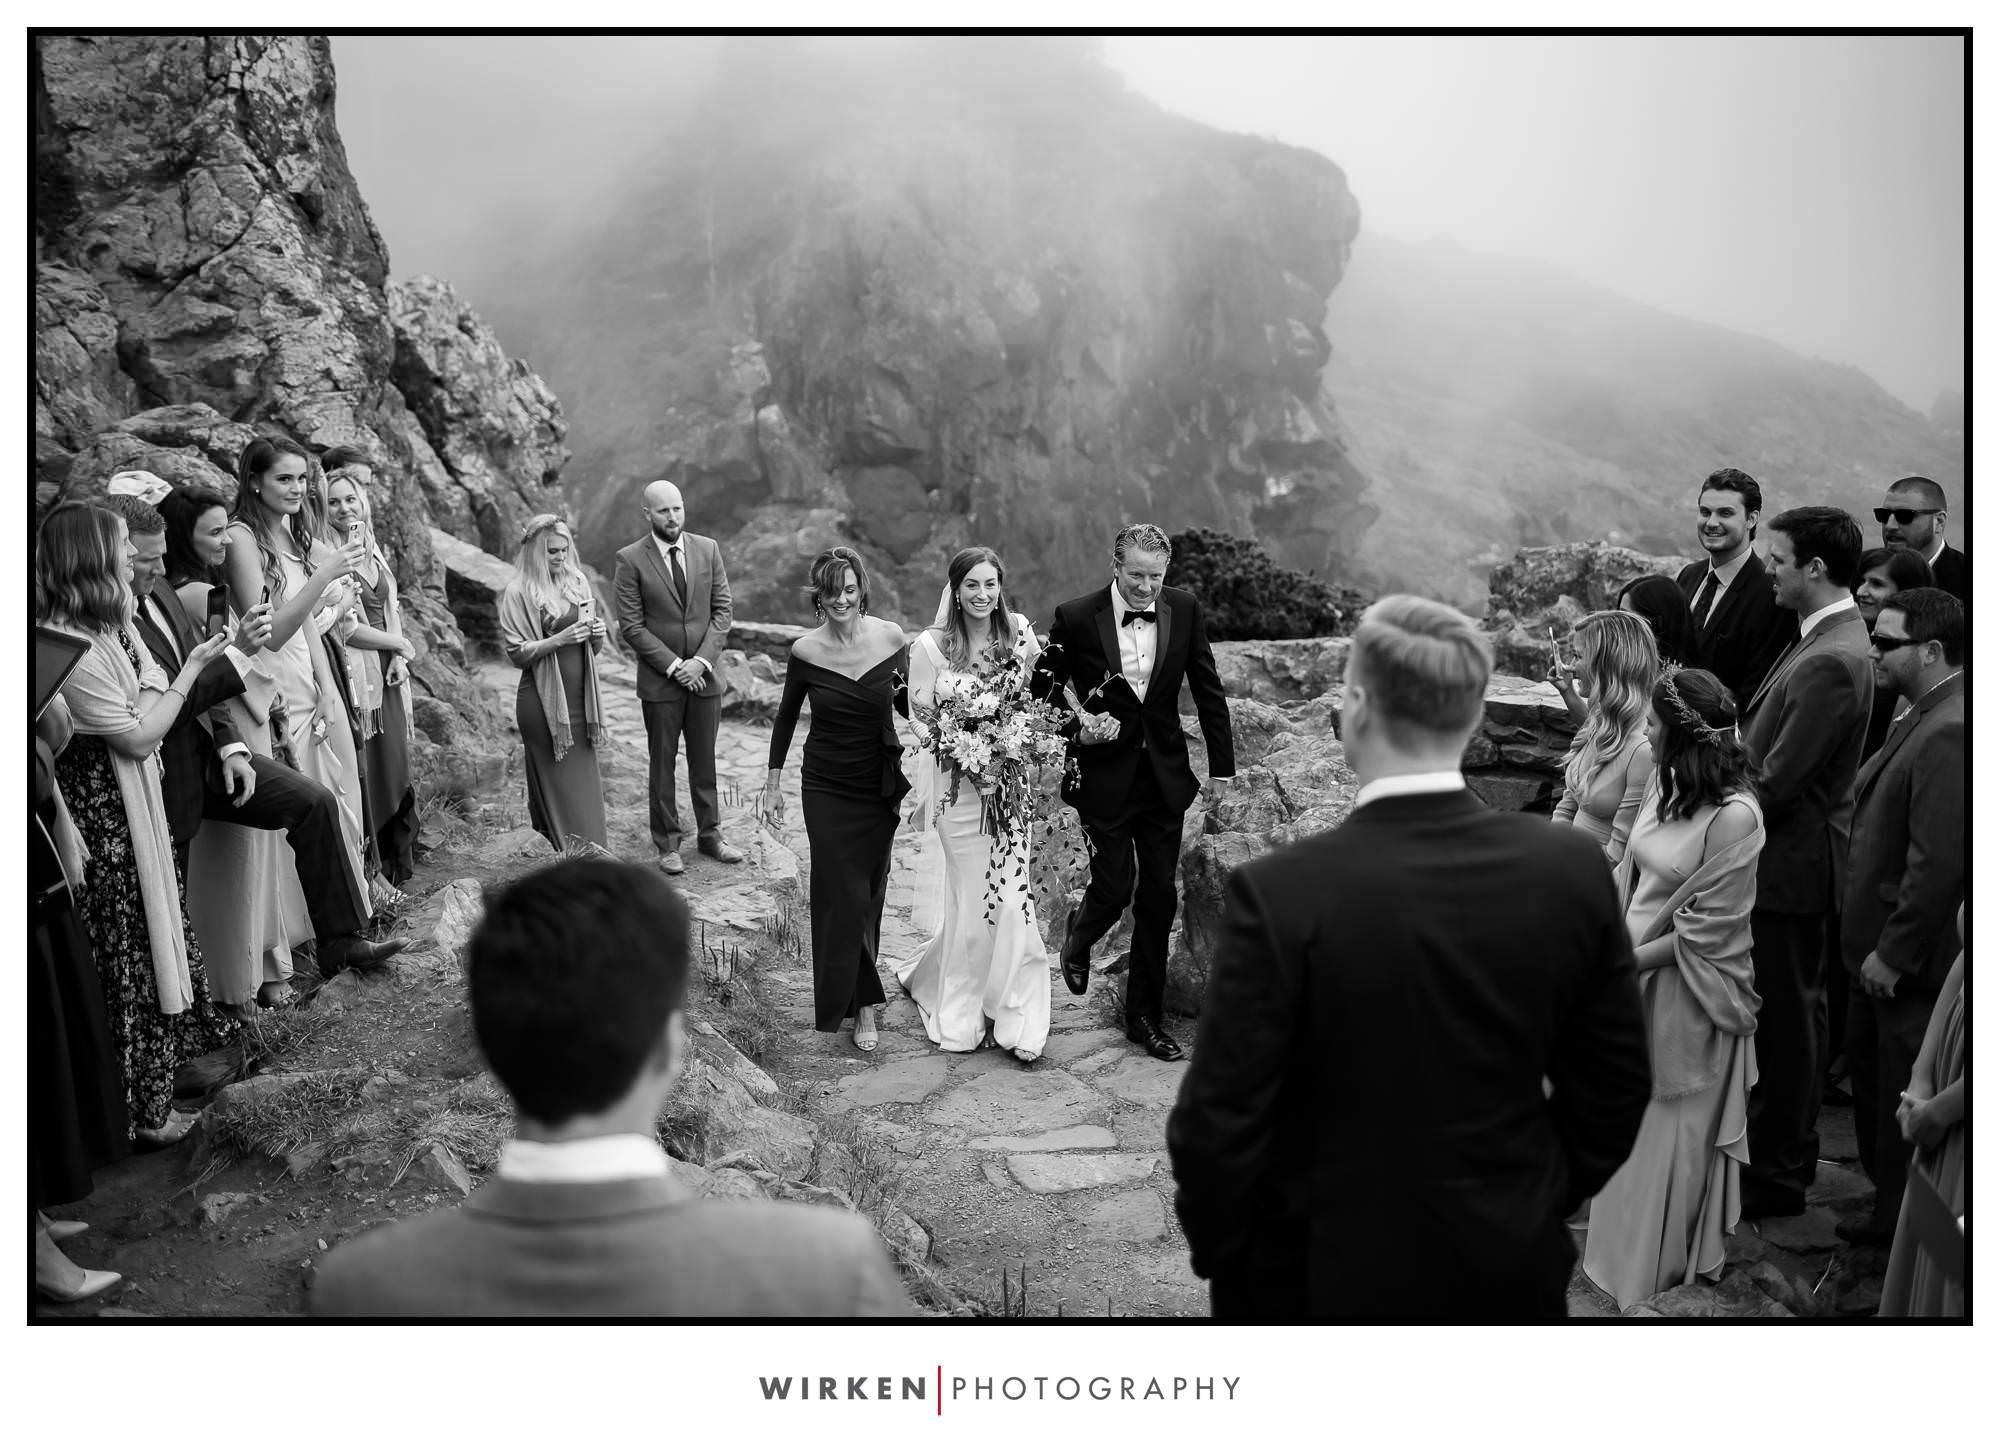 Wedding Rock Patrick's Point State Park wedding ceremony on rock